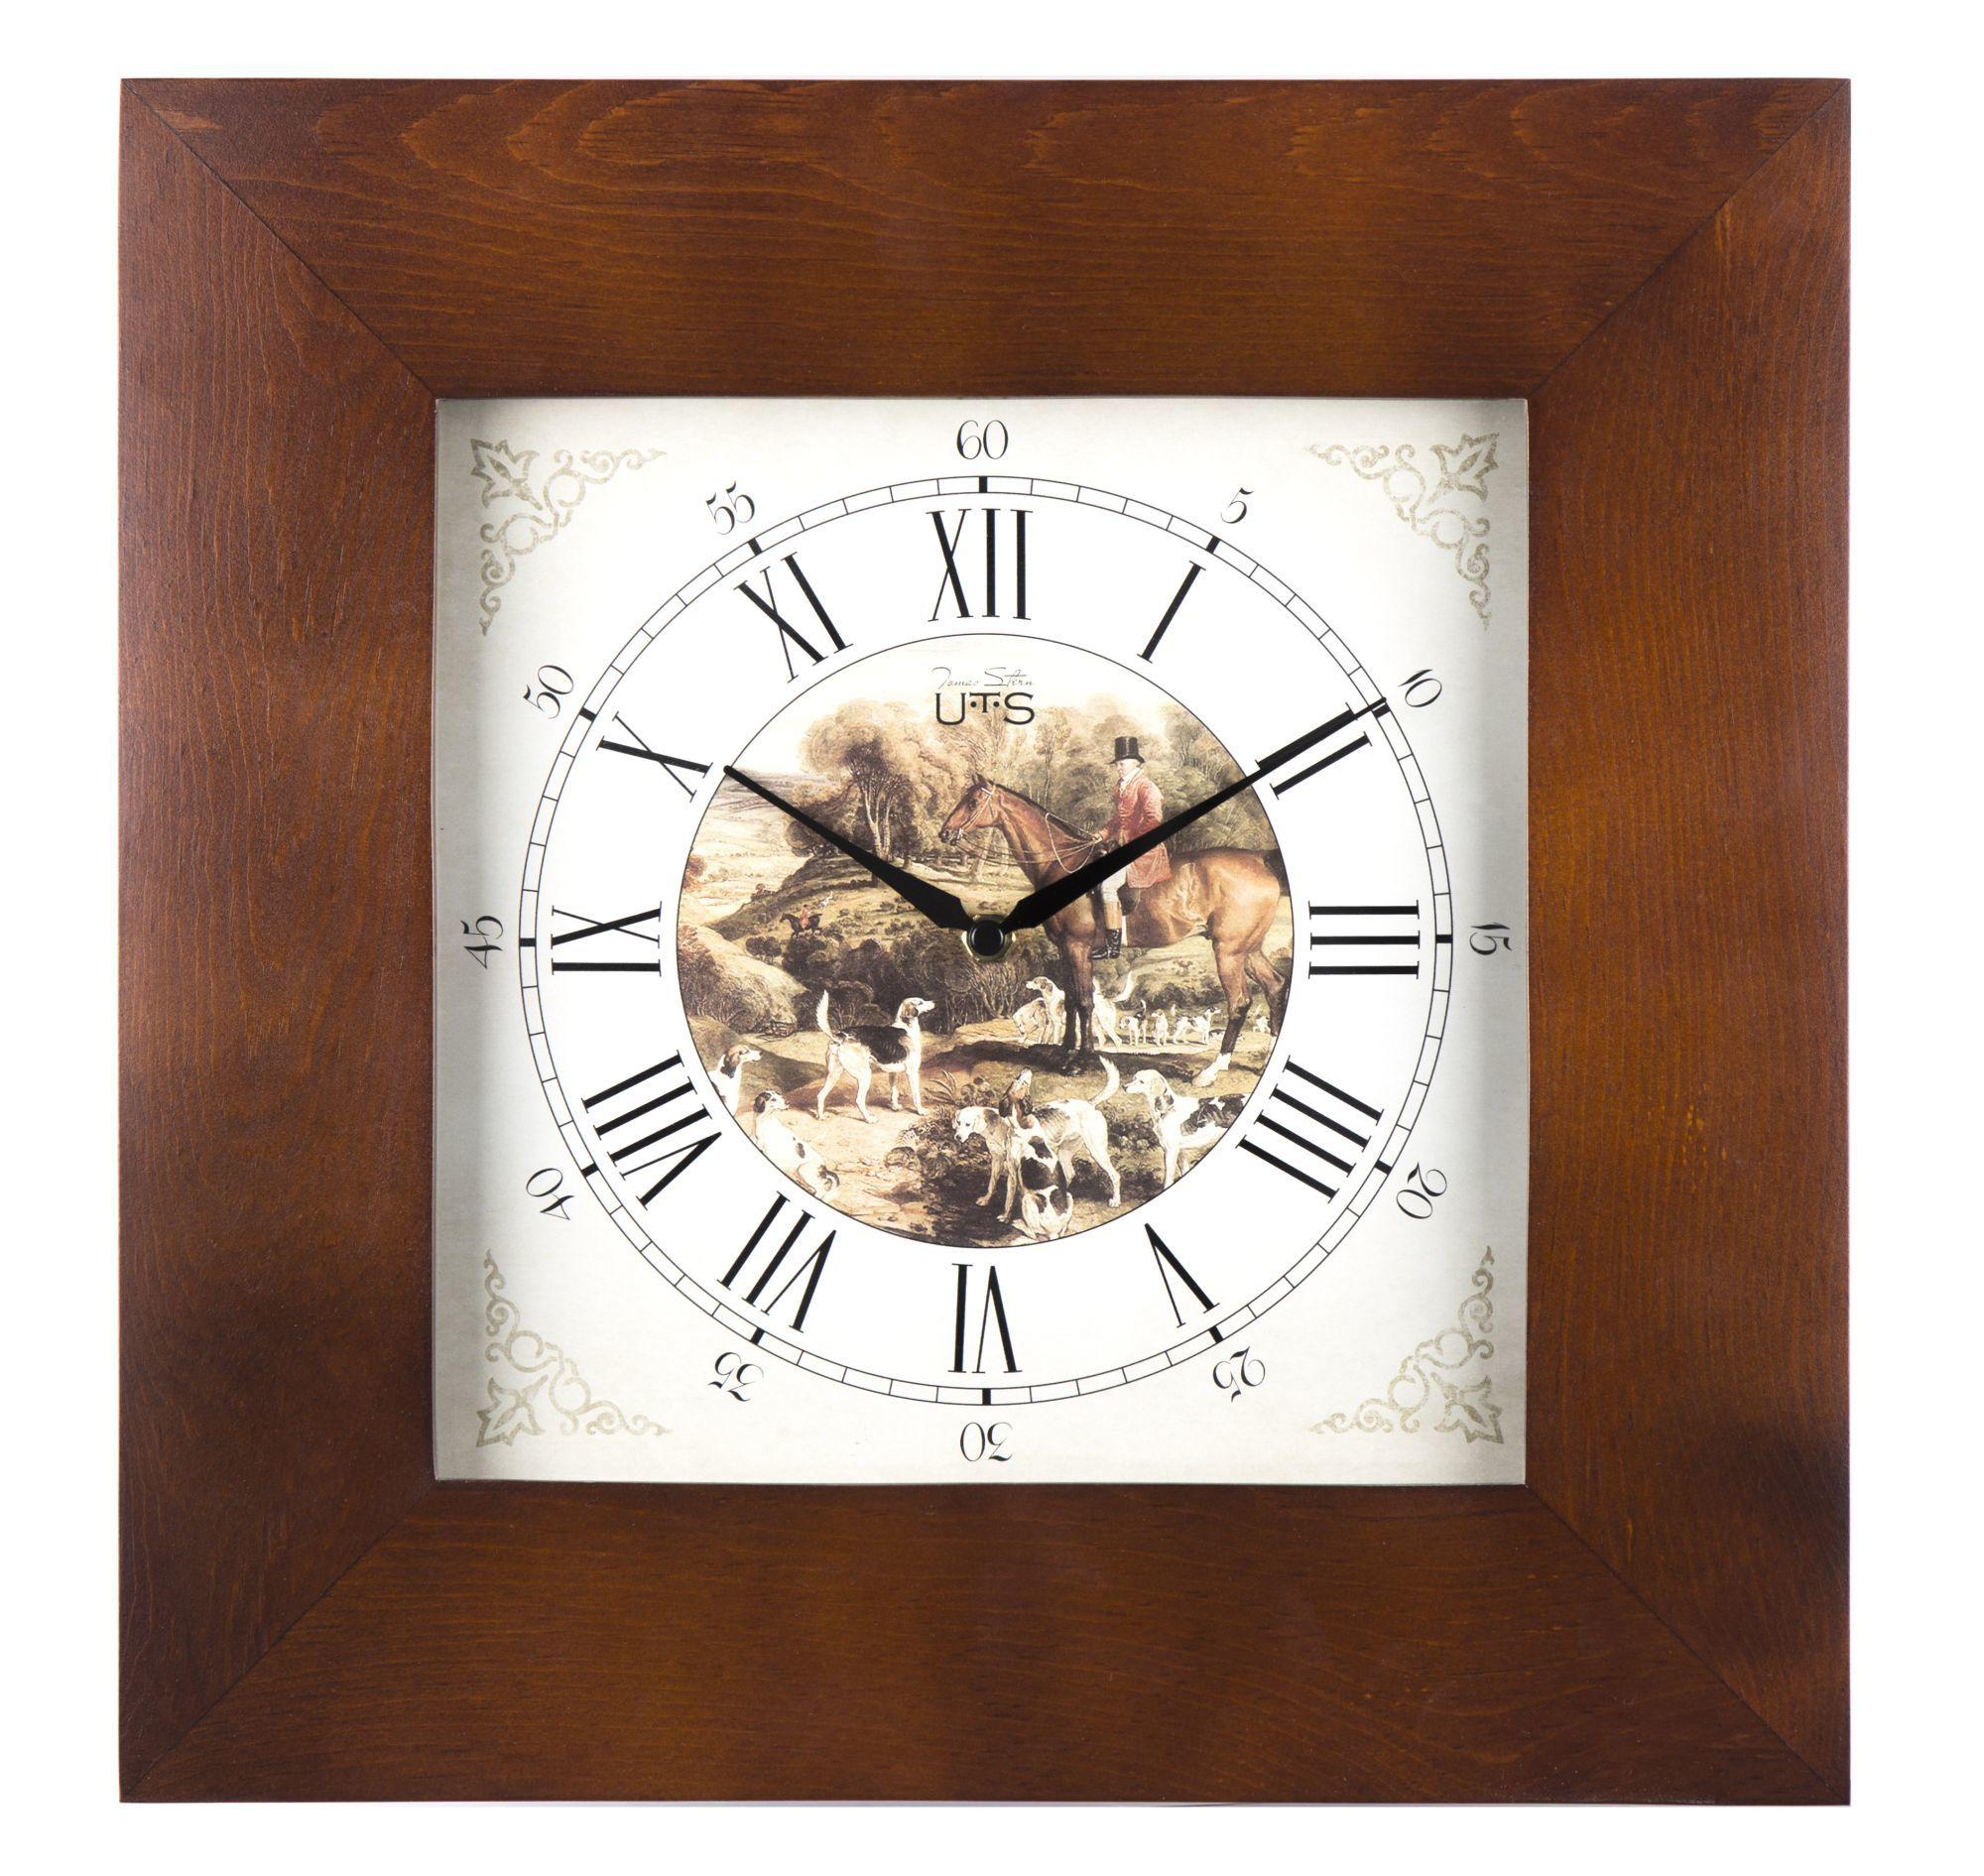 Часы настенные Часы настенные Tomas Stern 7021 chasy-nastennye-tomas-stern-7021-germaniya-tayvan.jpg